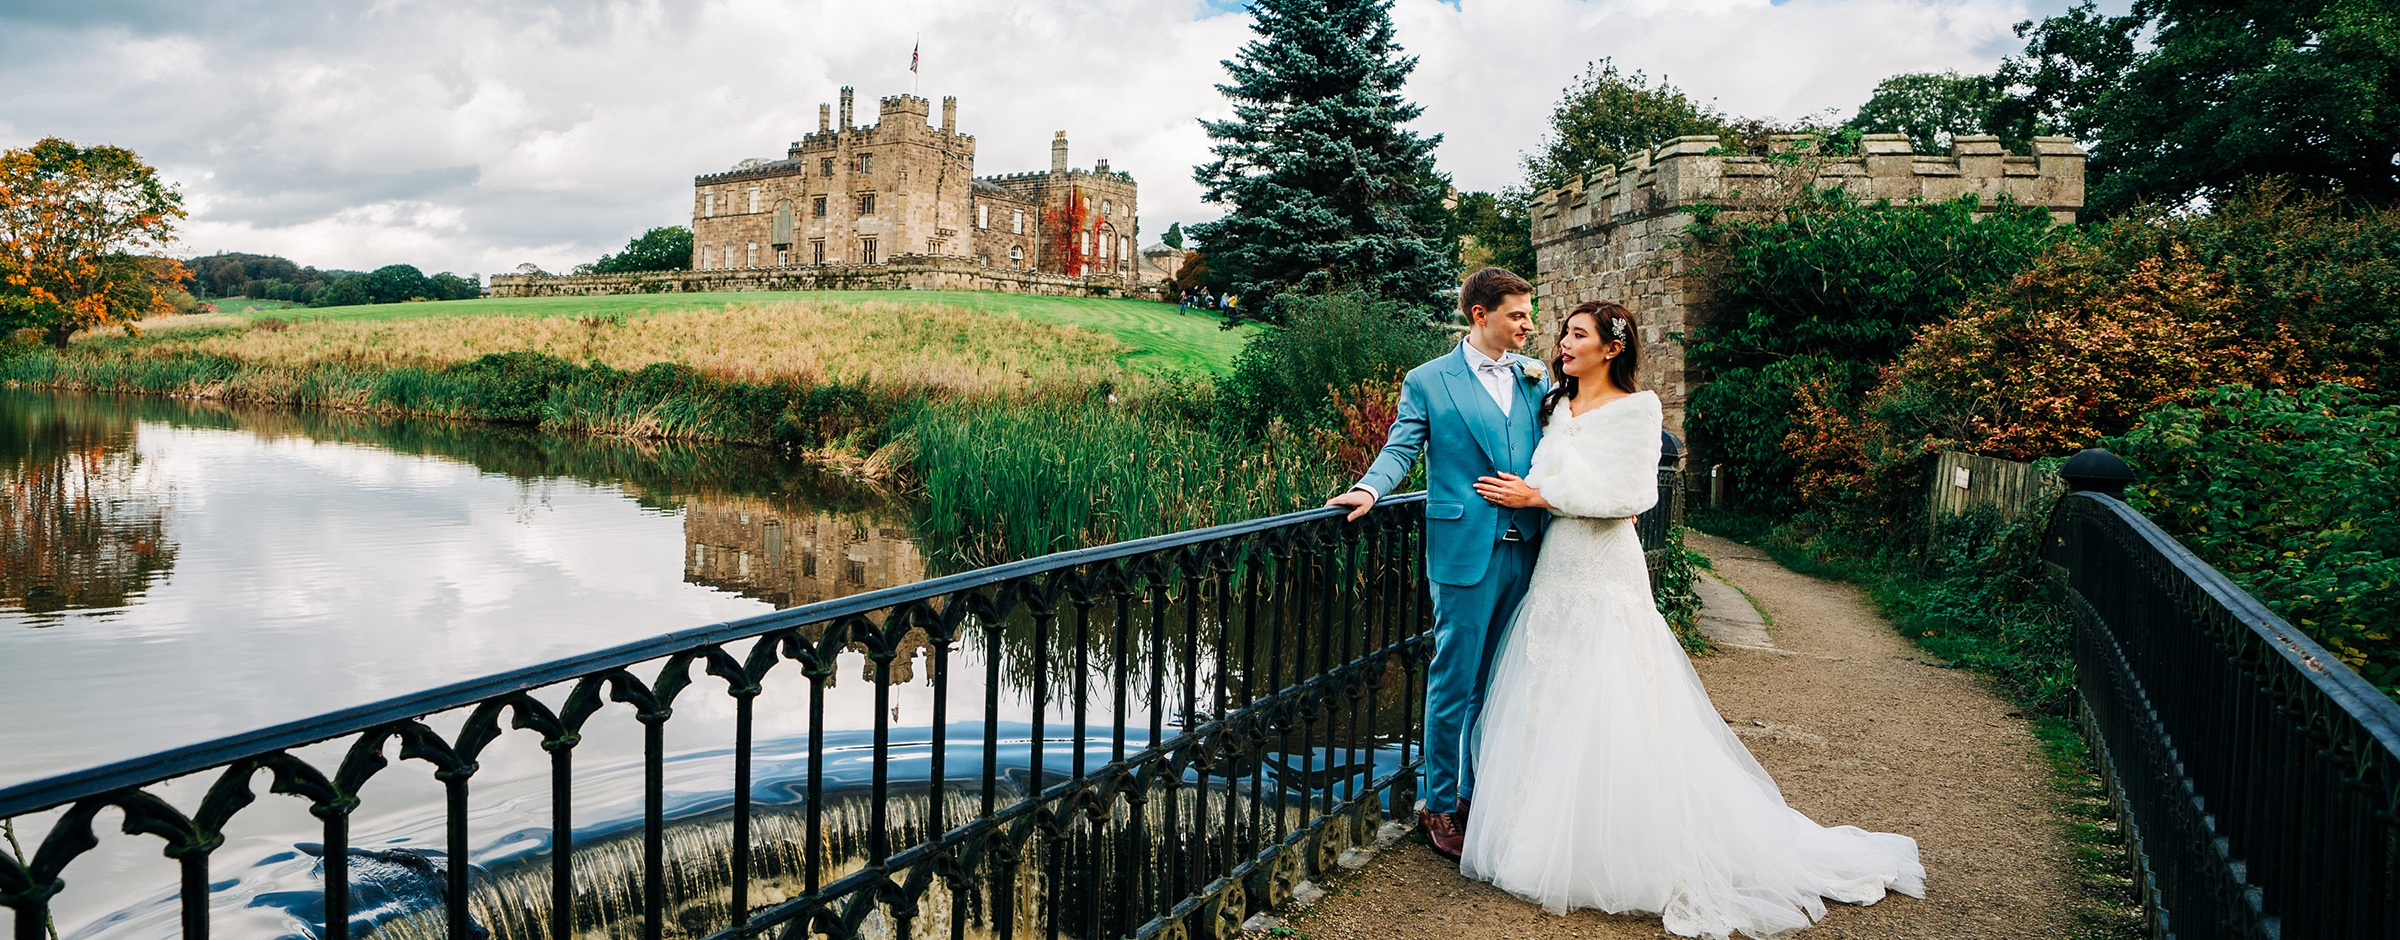 Ripley Castle Wedding Photography 4